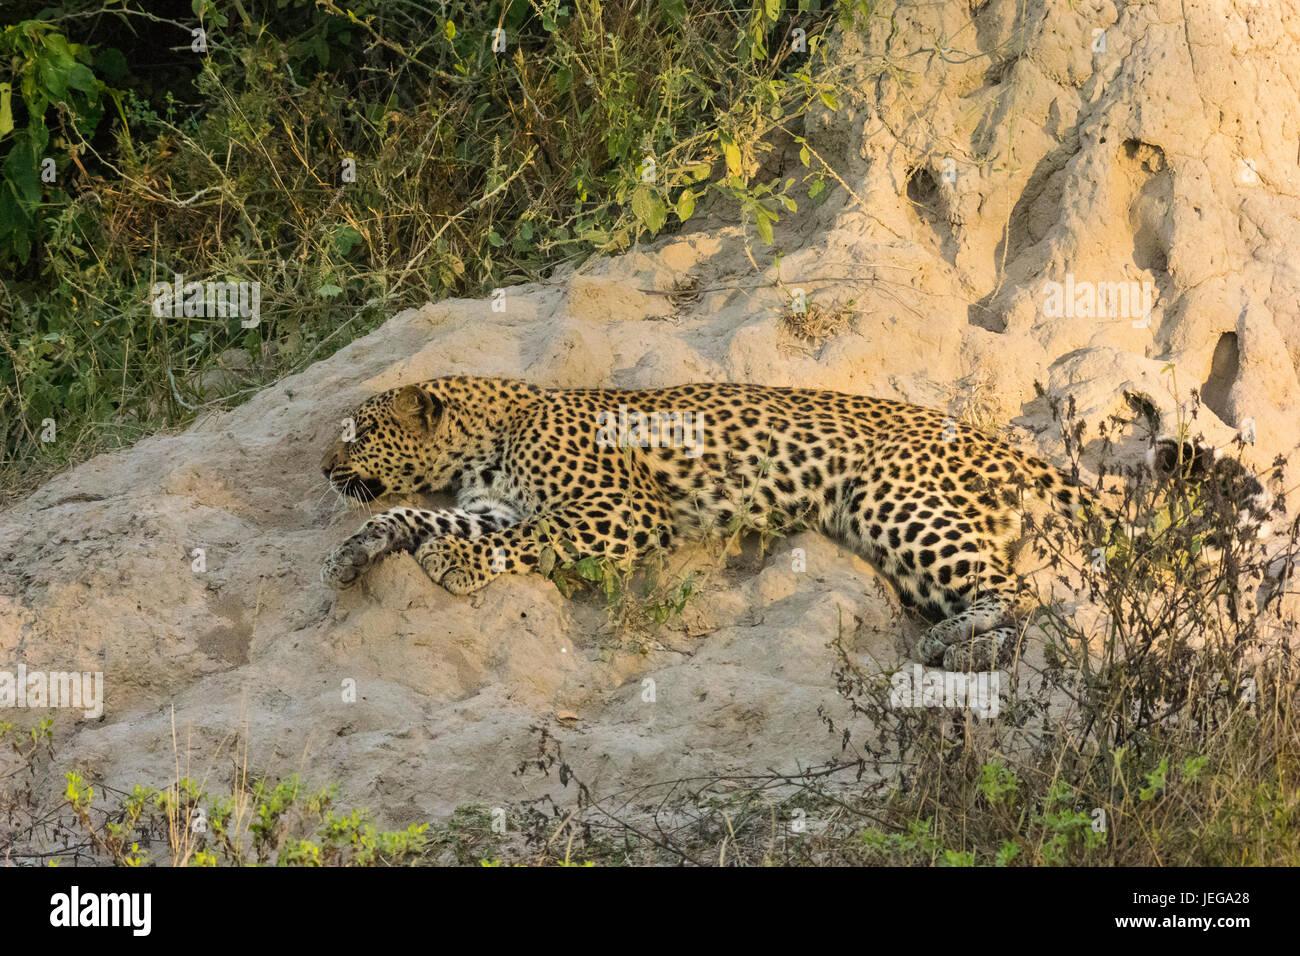 Female leopard (Panthera pardus)  lying alongside a termite mound in the Okavango Delta. - Stock Image